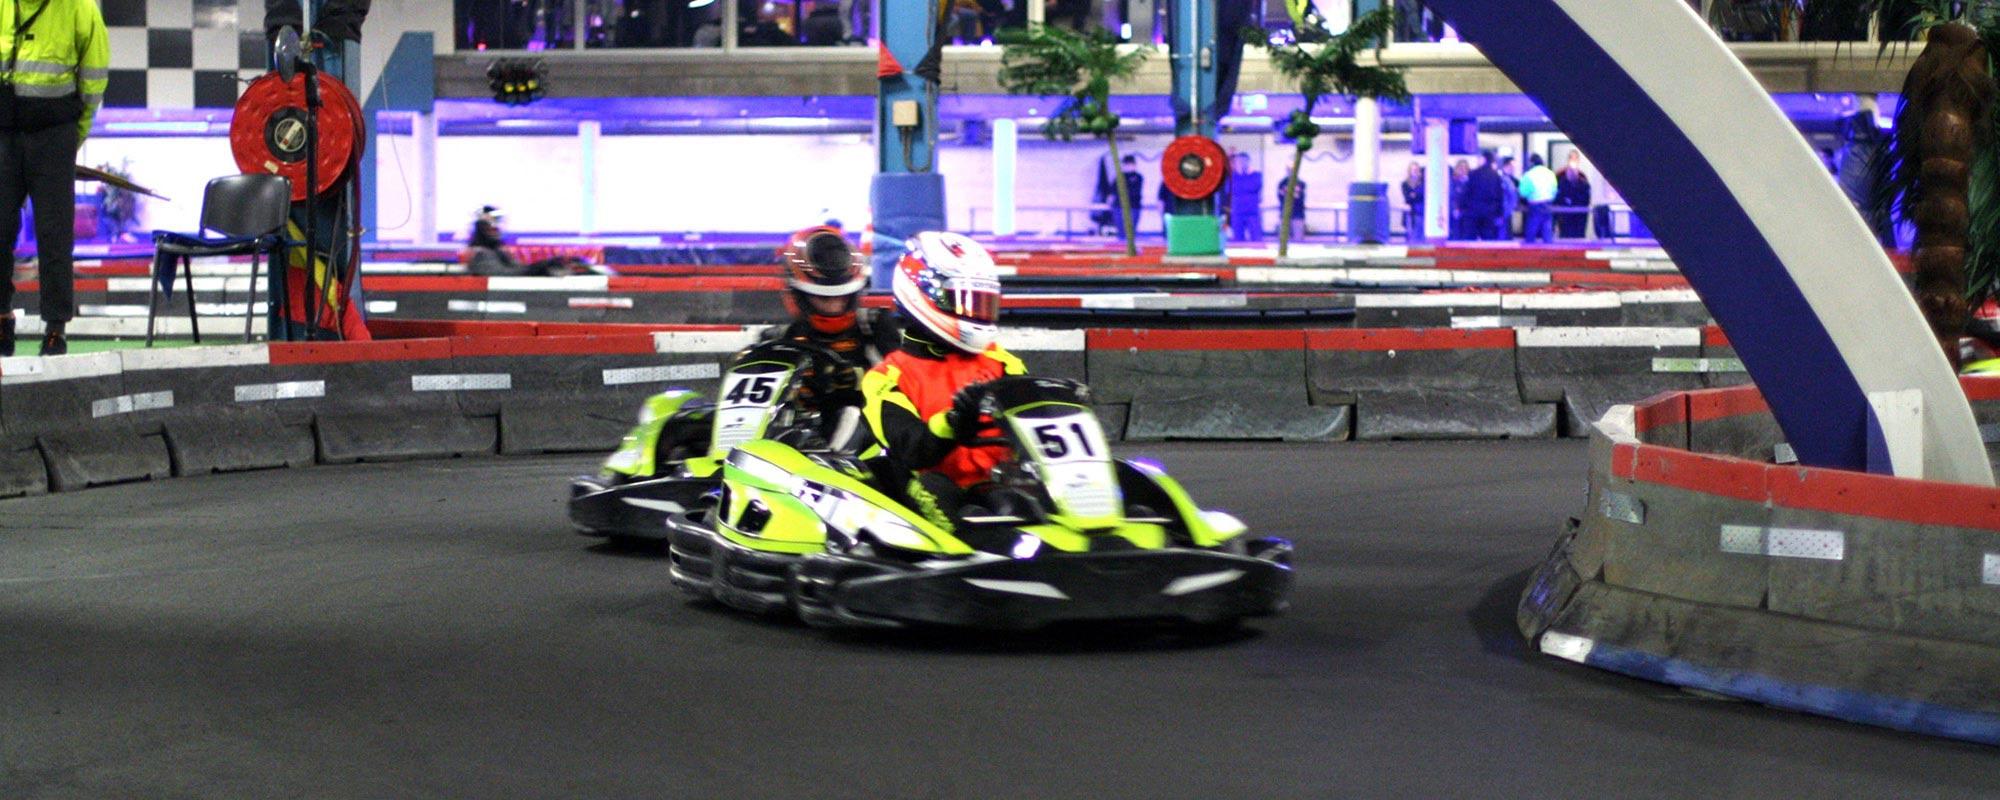 ebafkc-karting-2000x800-07